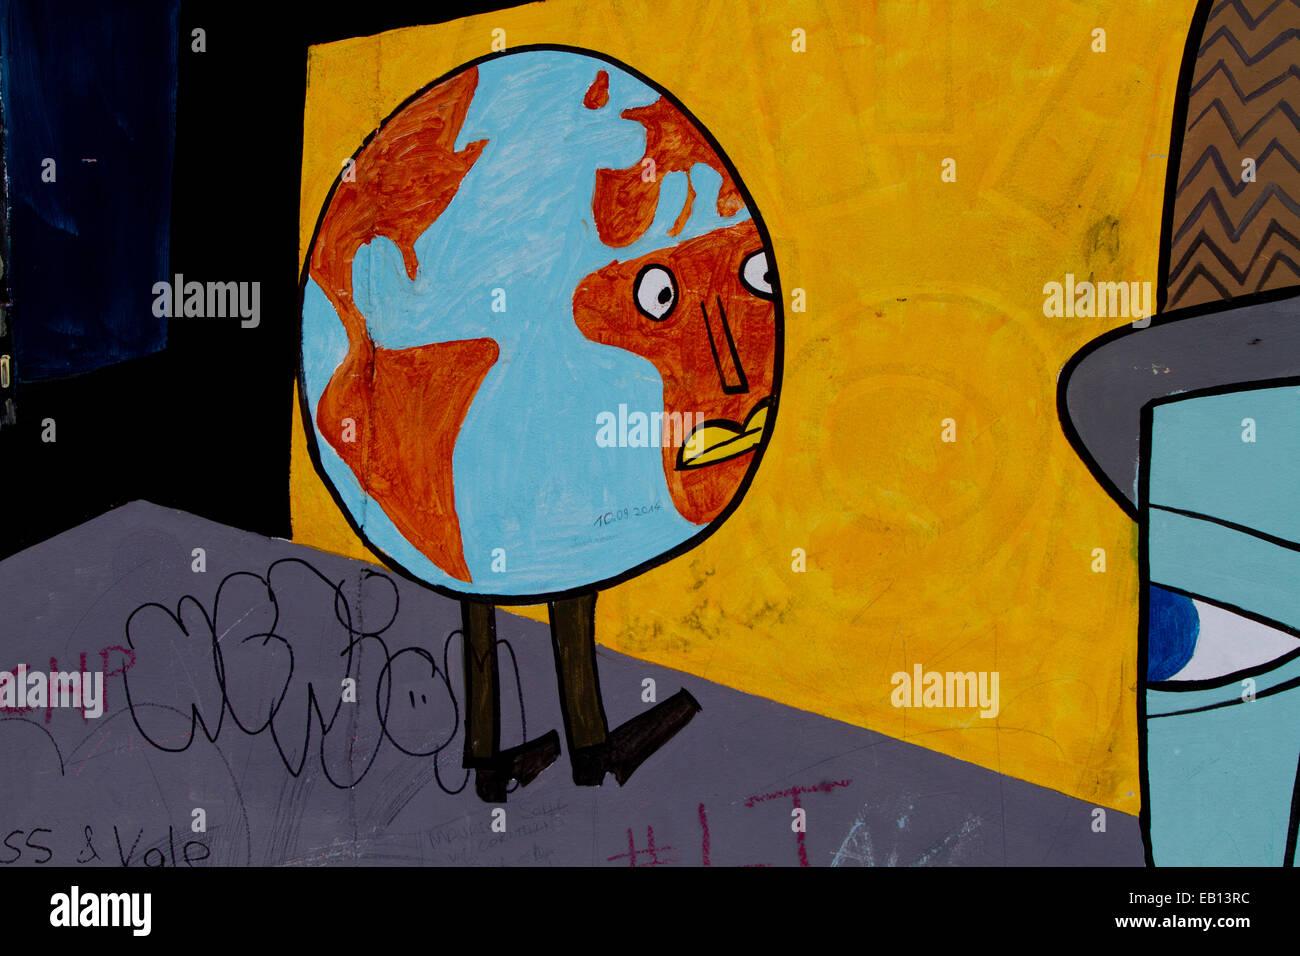 Earth Cartoon Stock Photos & Earth Cartoon Stock Images - Alamy